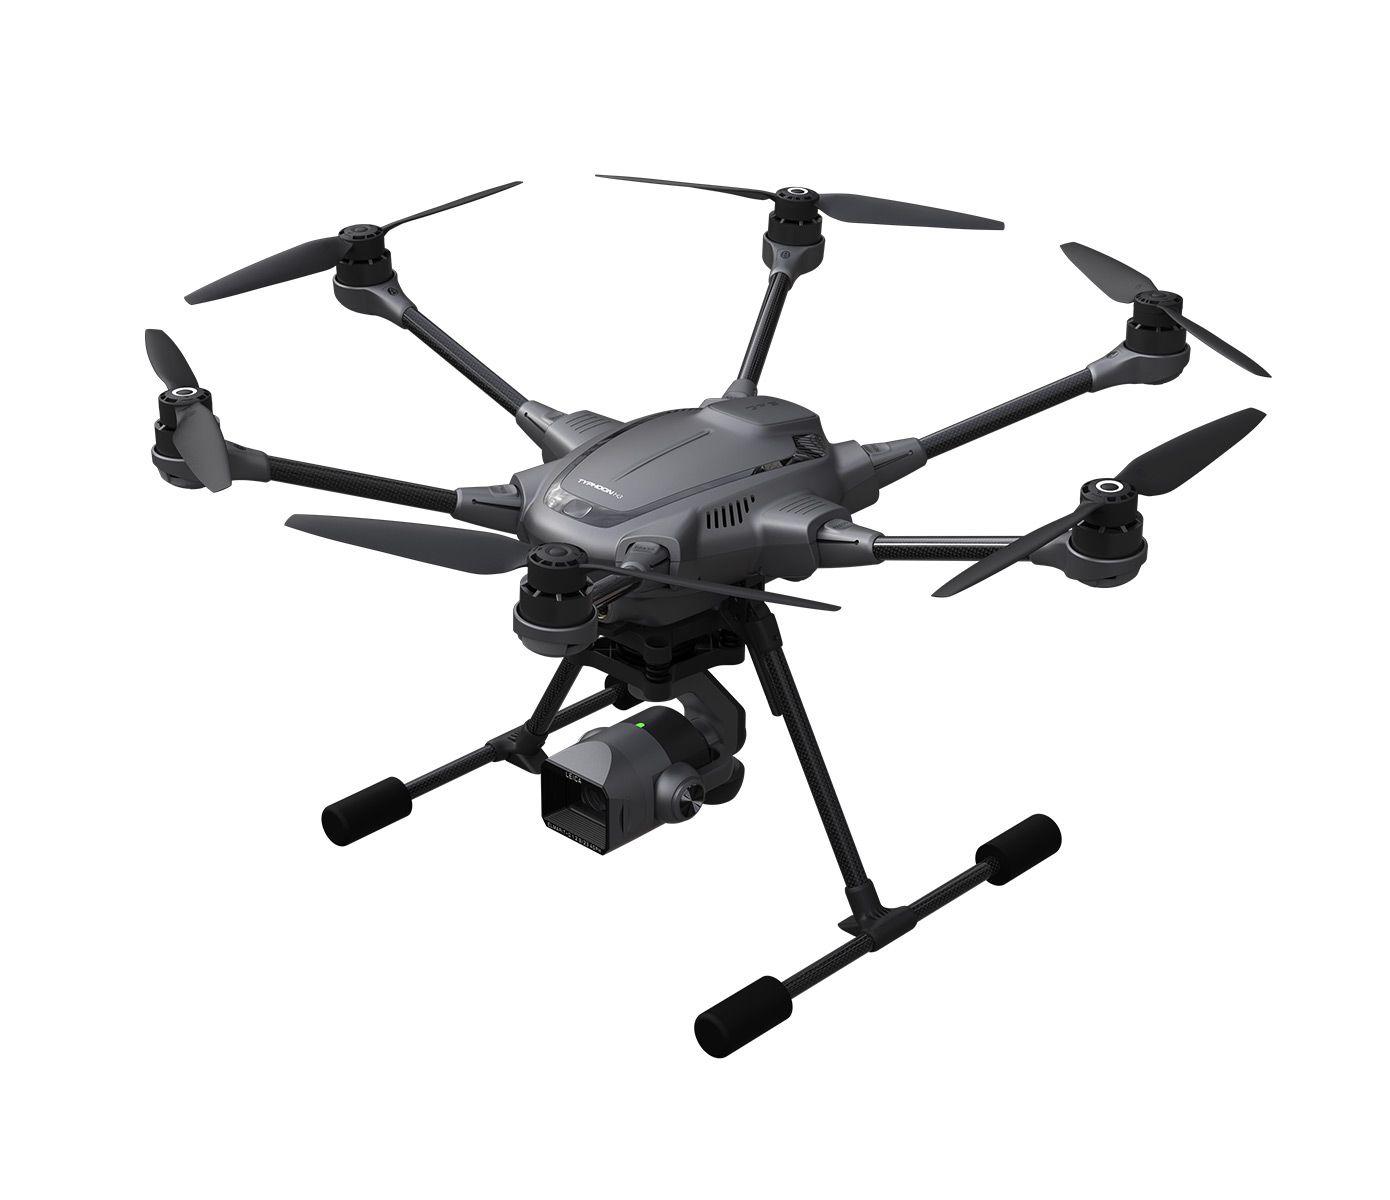 Yuneec Typhoon H3 | Best Drones for photogrammetry